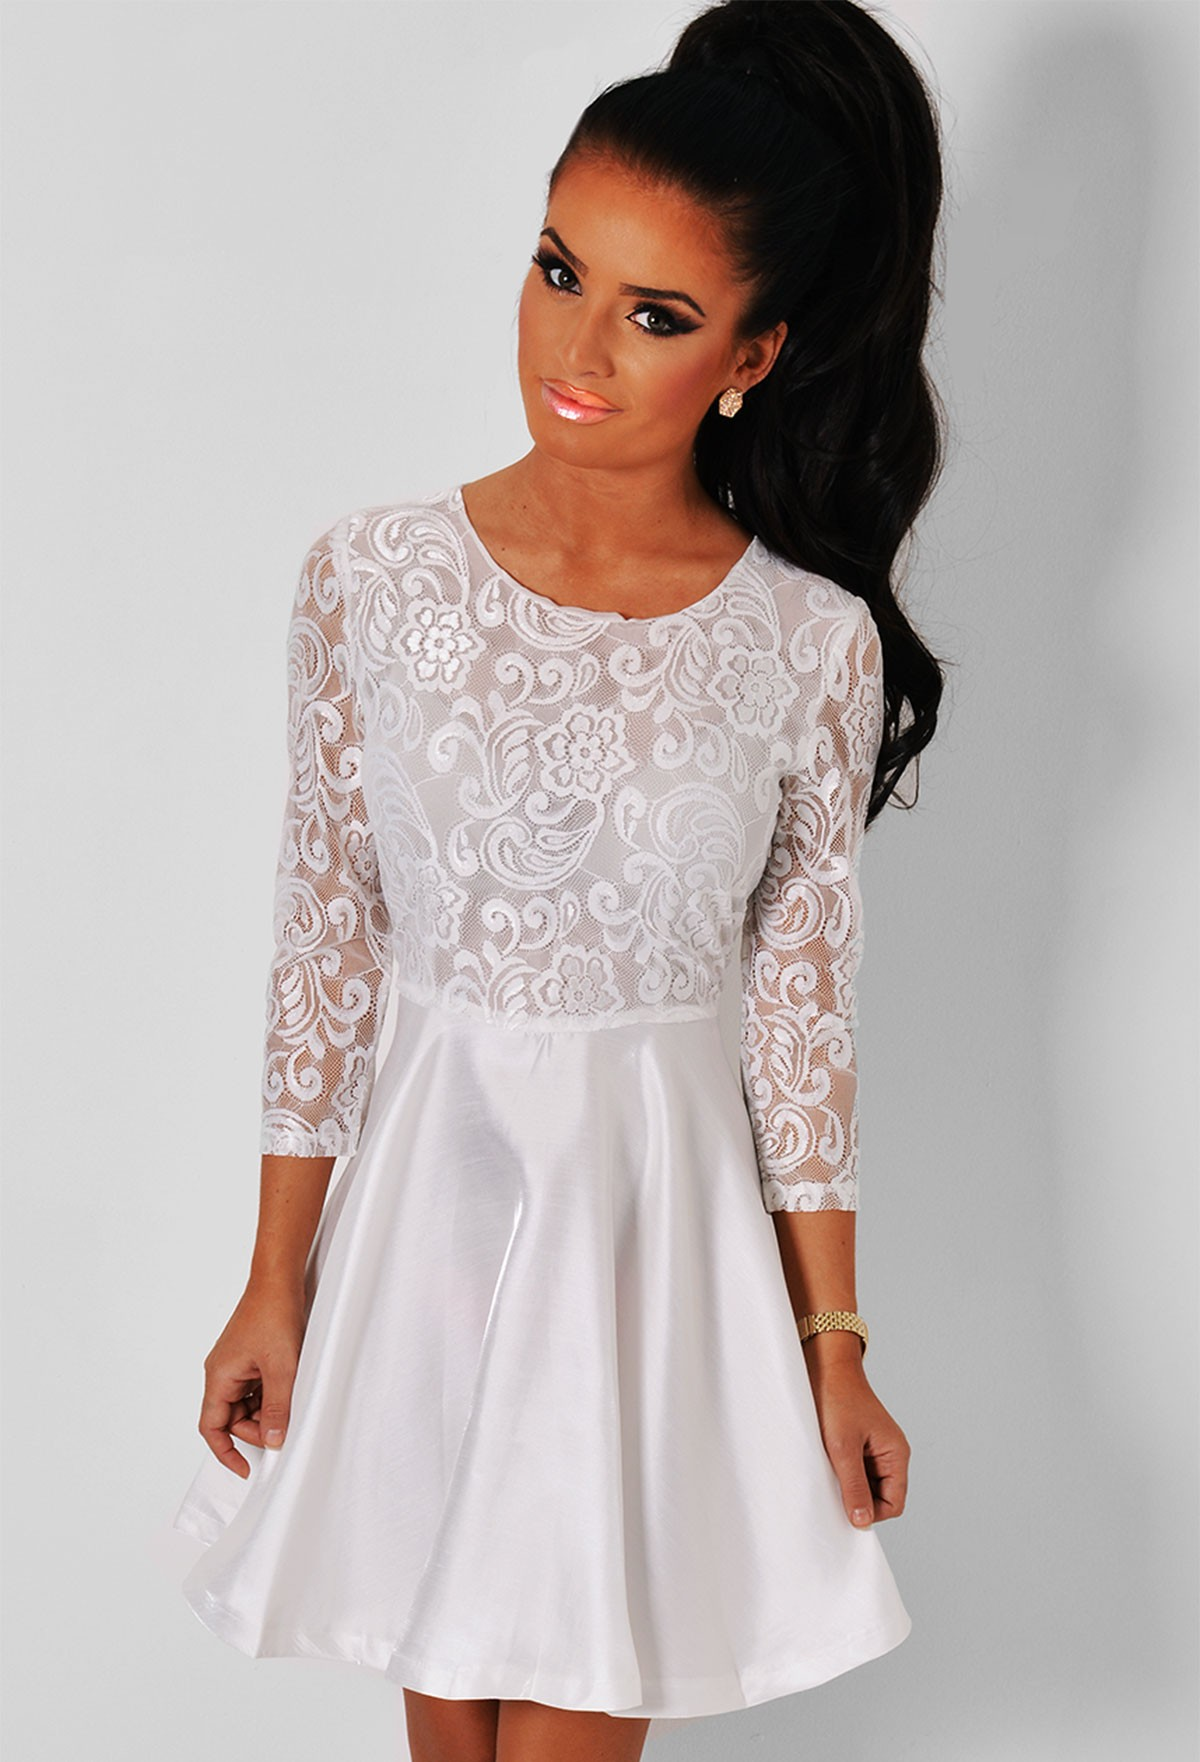 2920bbcb9f Angel White Long Sleeved Lace Skater Dress